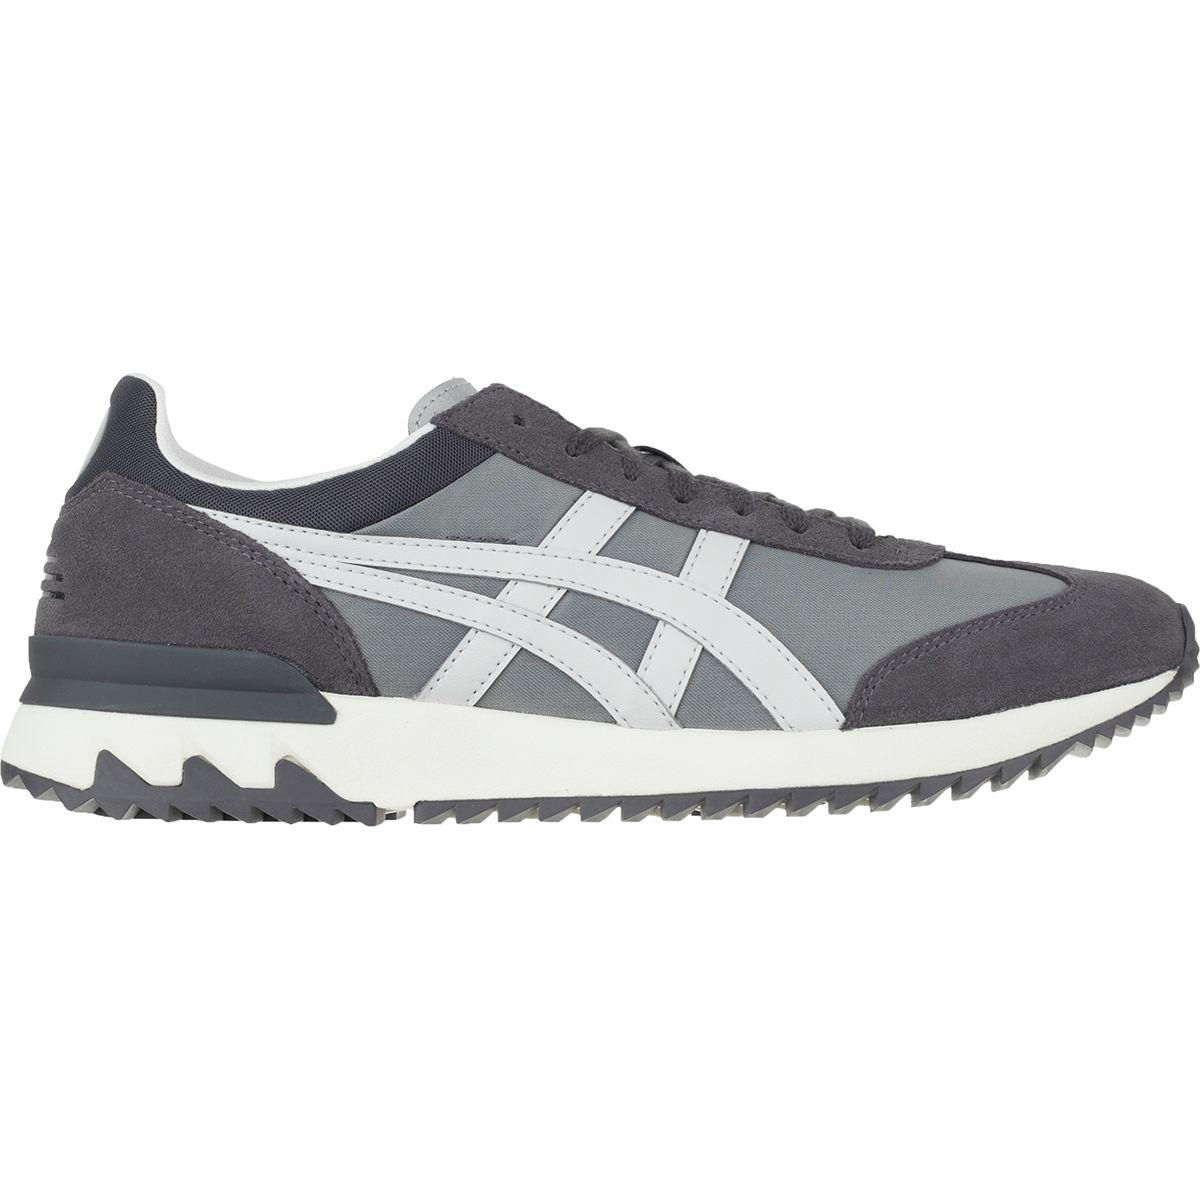 CALIFORNIA 78 EX - Sneaker low - stone grey/glacier grey V8r5S2